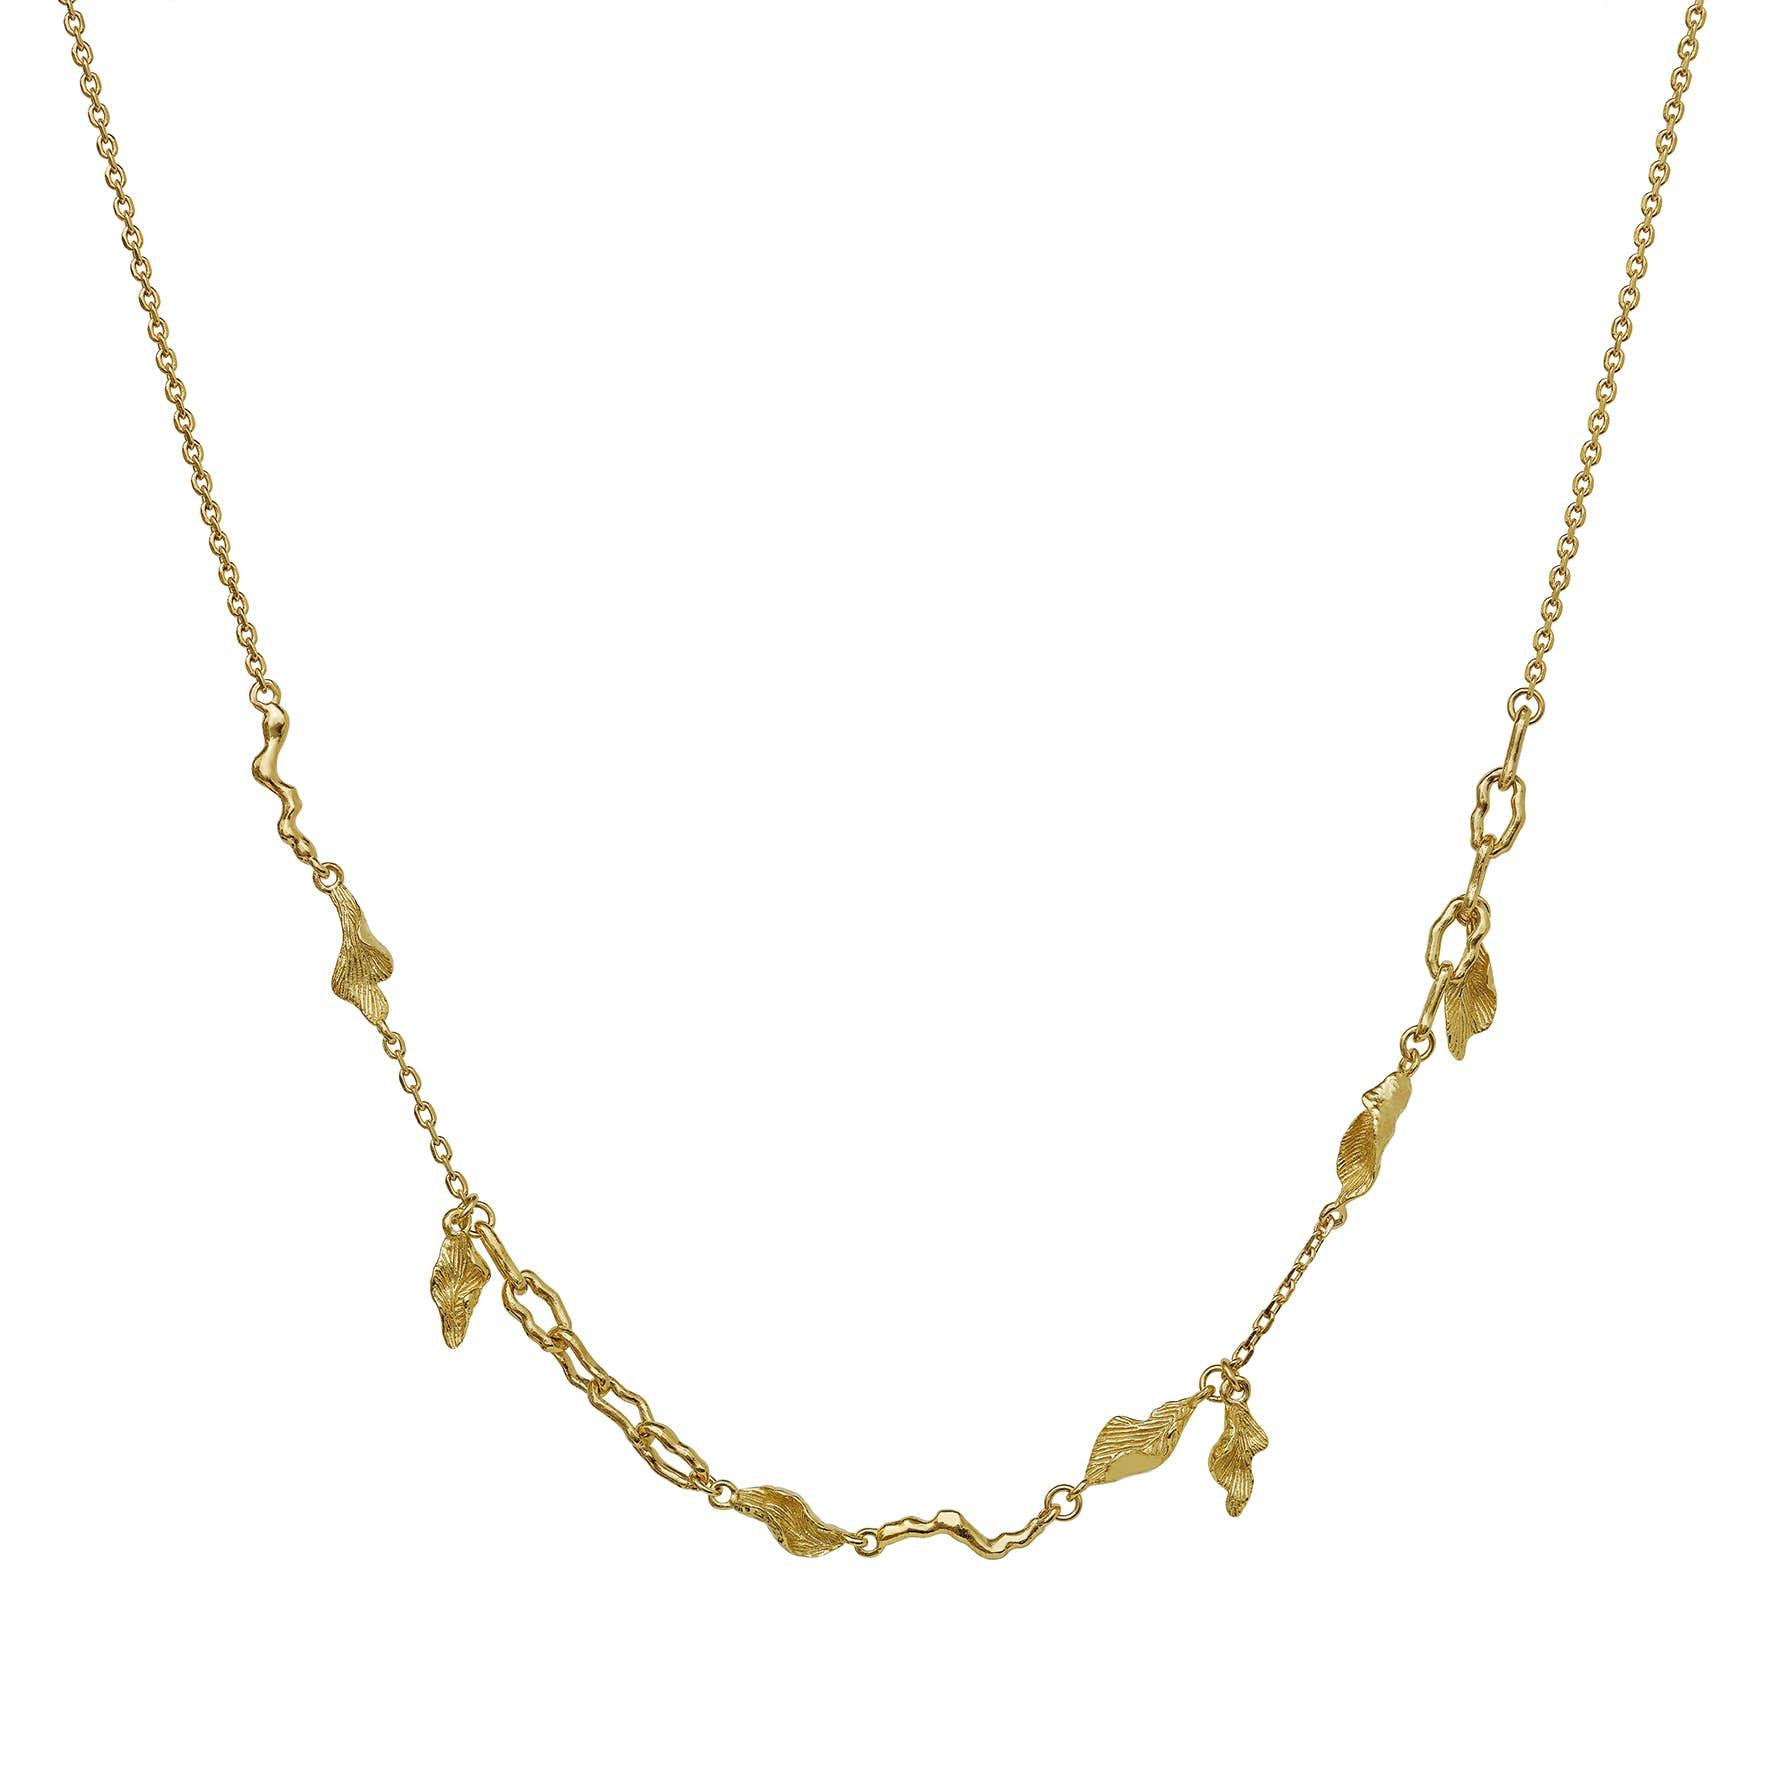 Lenani Necklace fra Maanesten i Forgyldt-Sølv Sterling 925